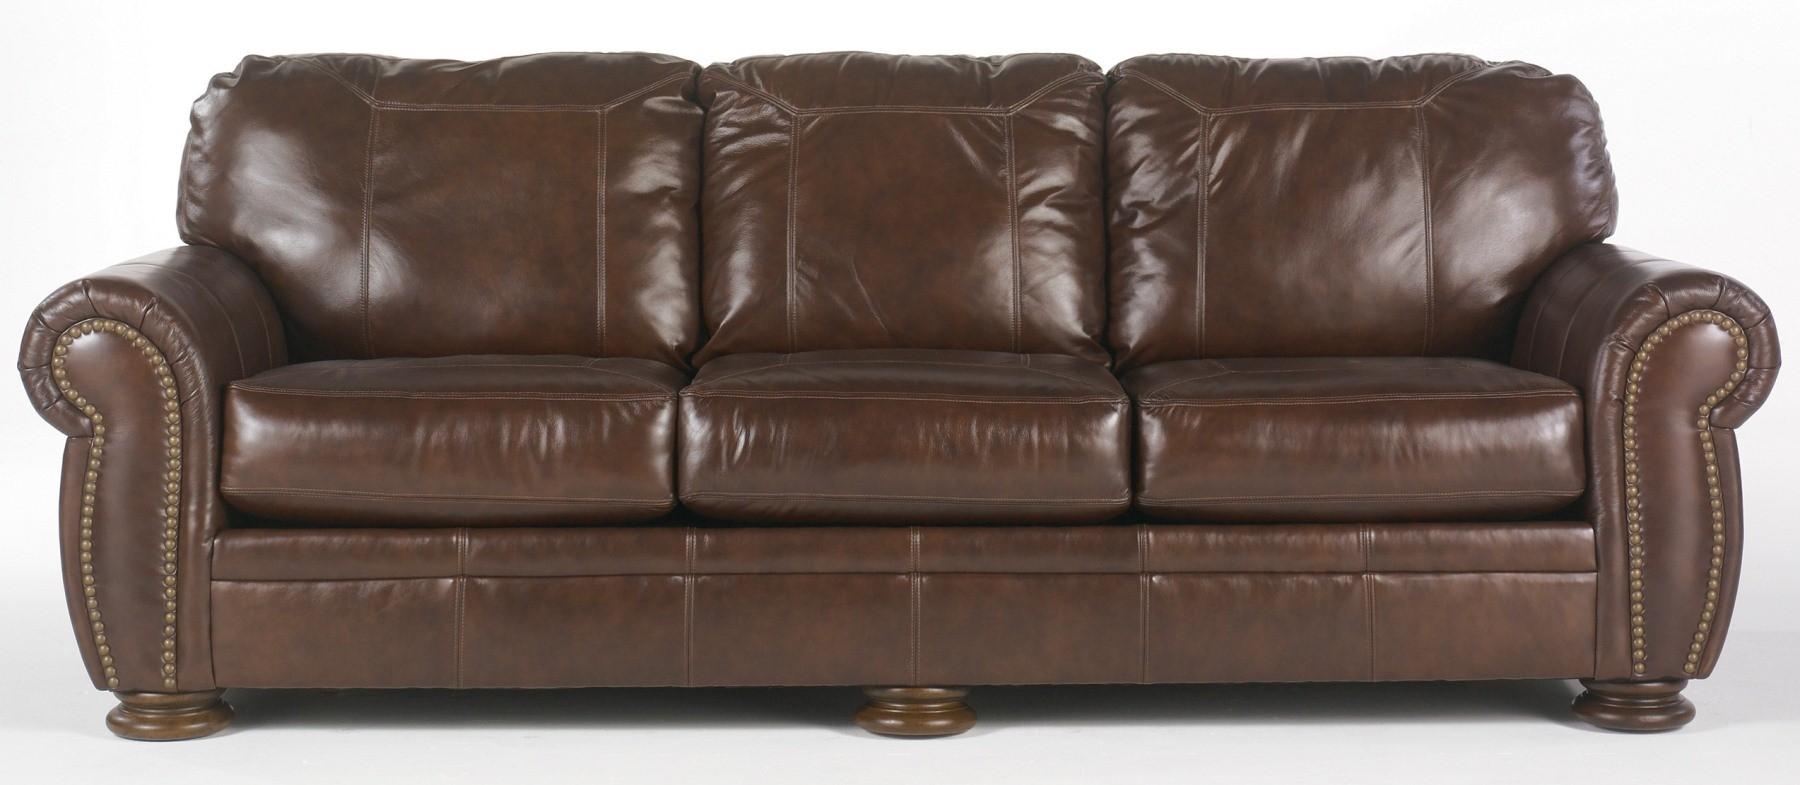 ashley furniture palmer sofa blue sofas images walnut by 2050038 leather